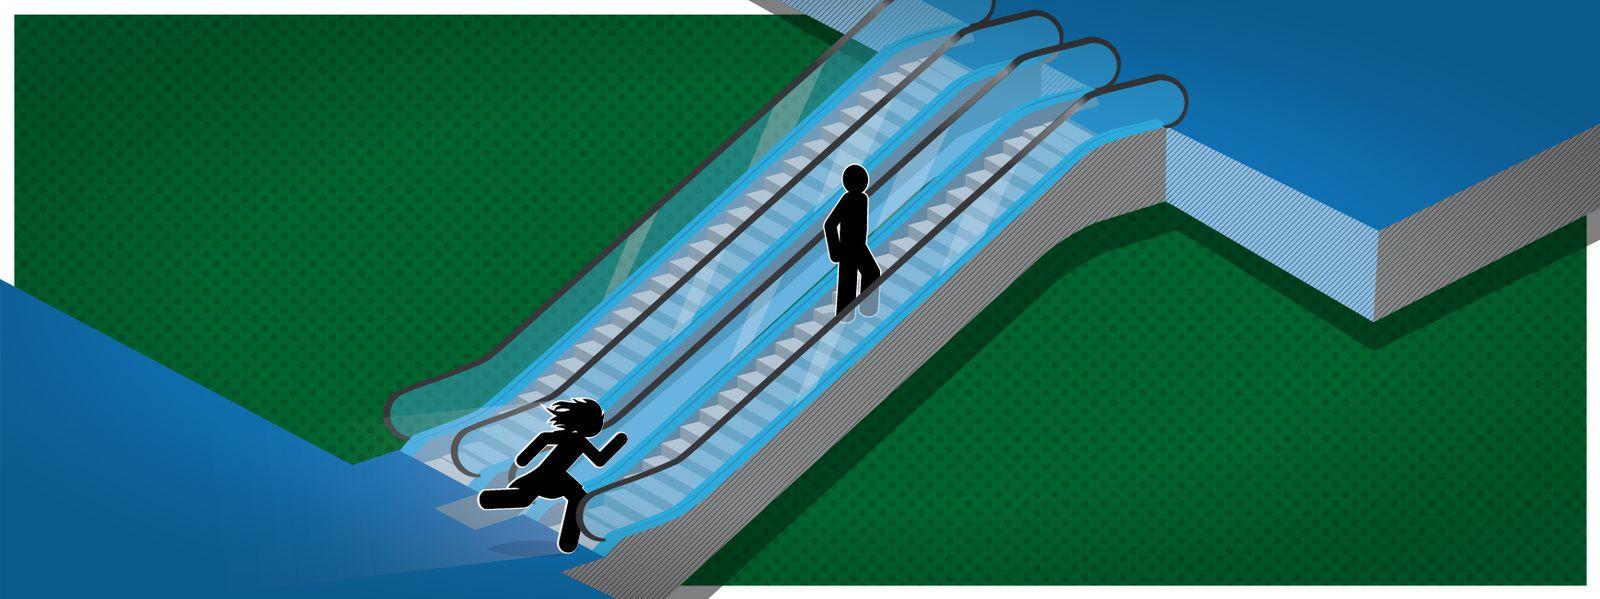 Rätsel der Woche Rolltreppe 2 v2